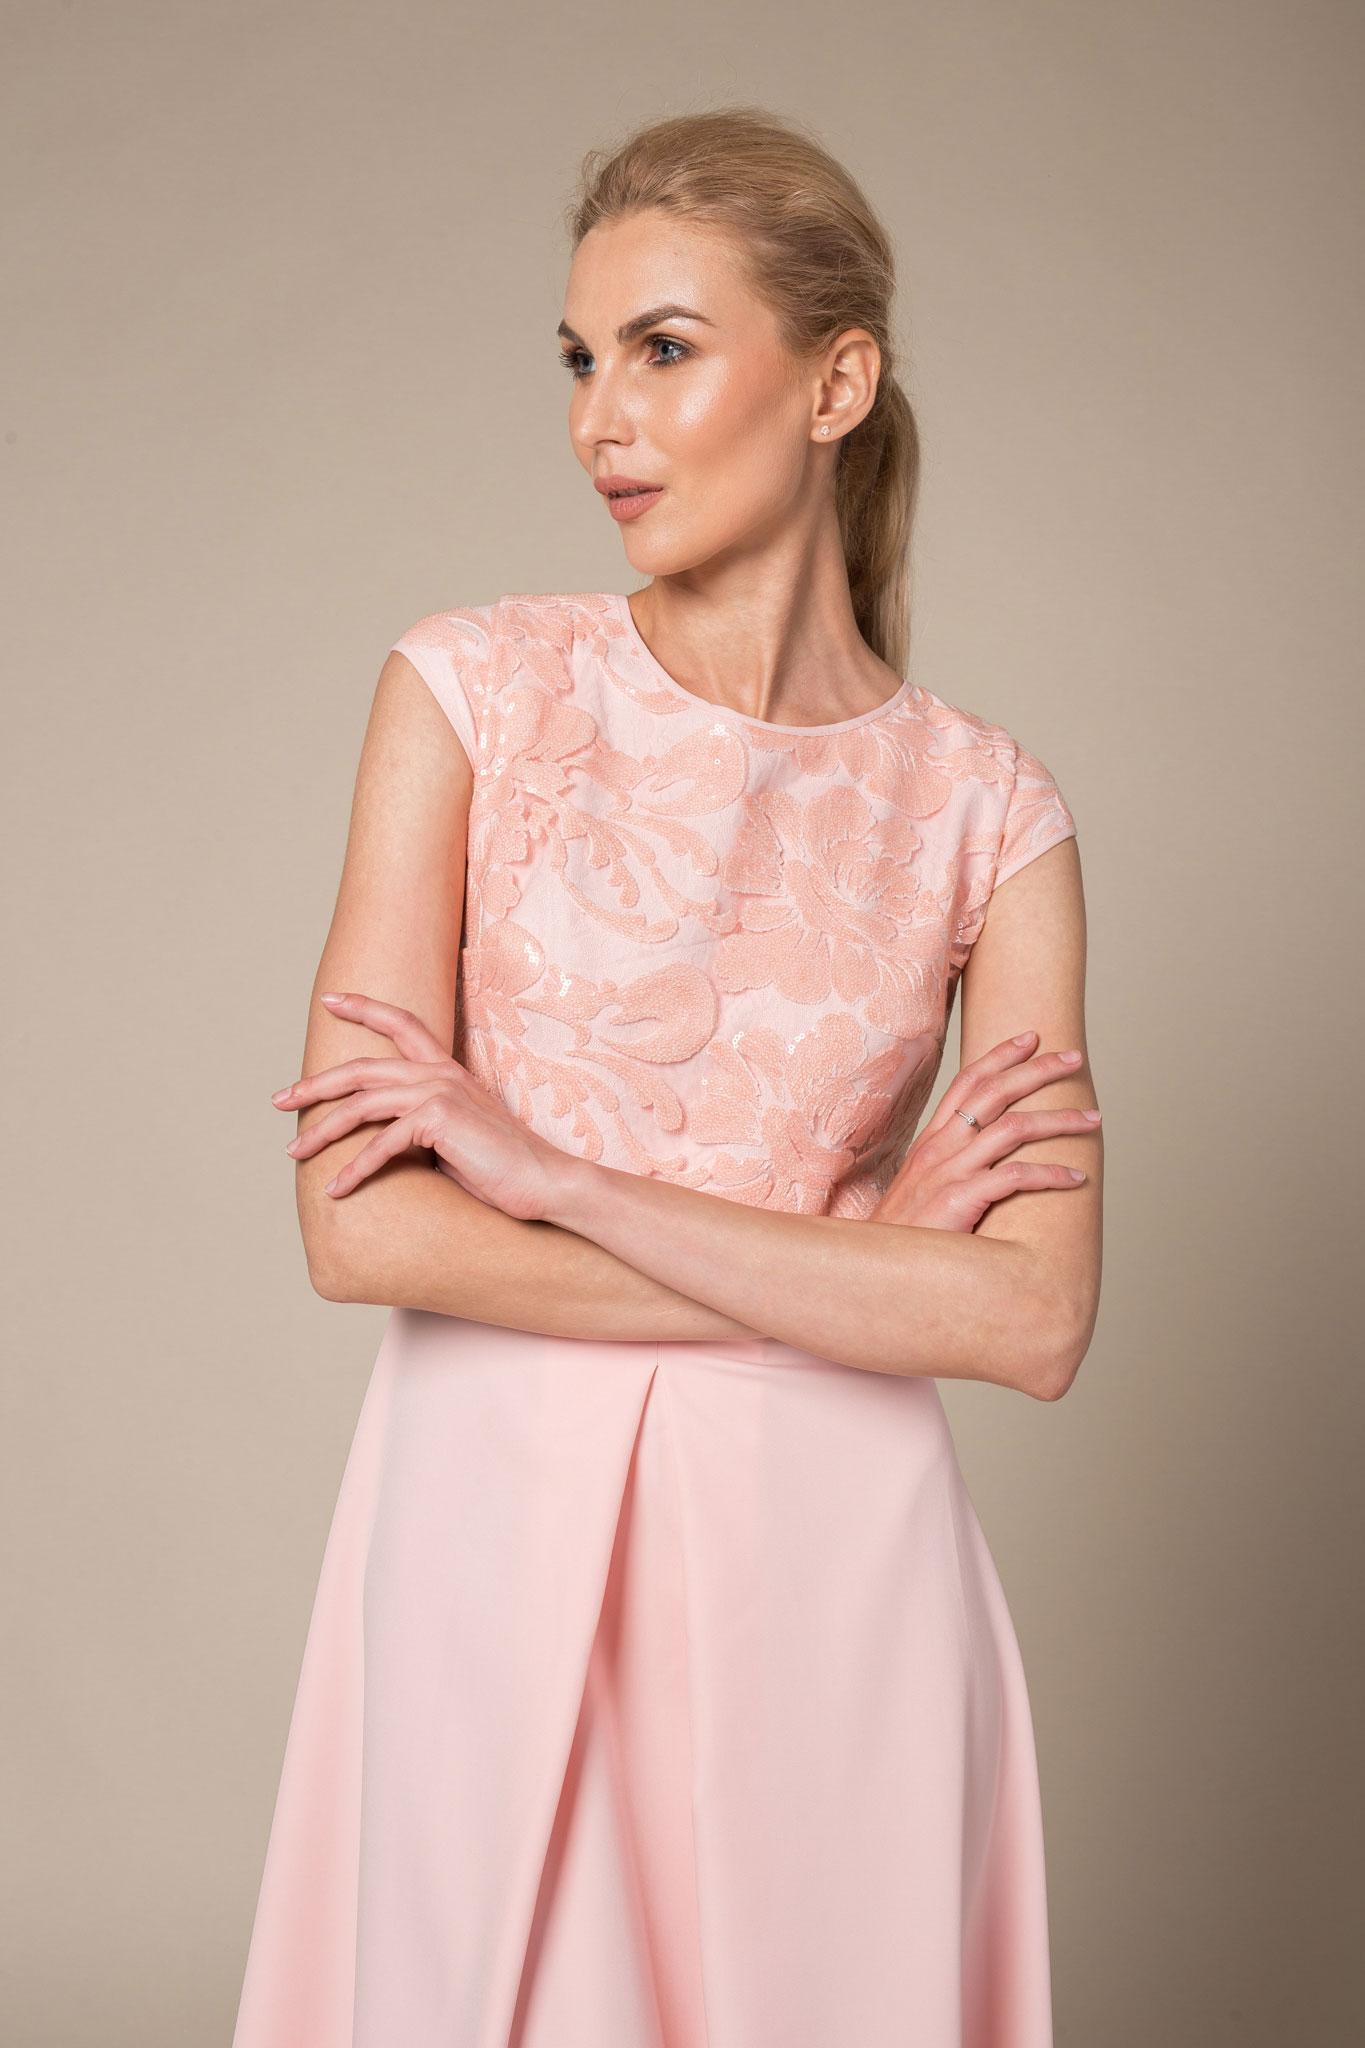 Blush Sequin Top Cap Sleeved Floor Length Evening Dress